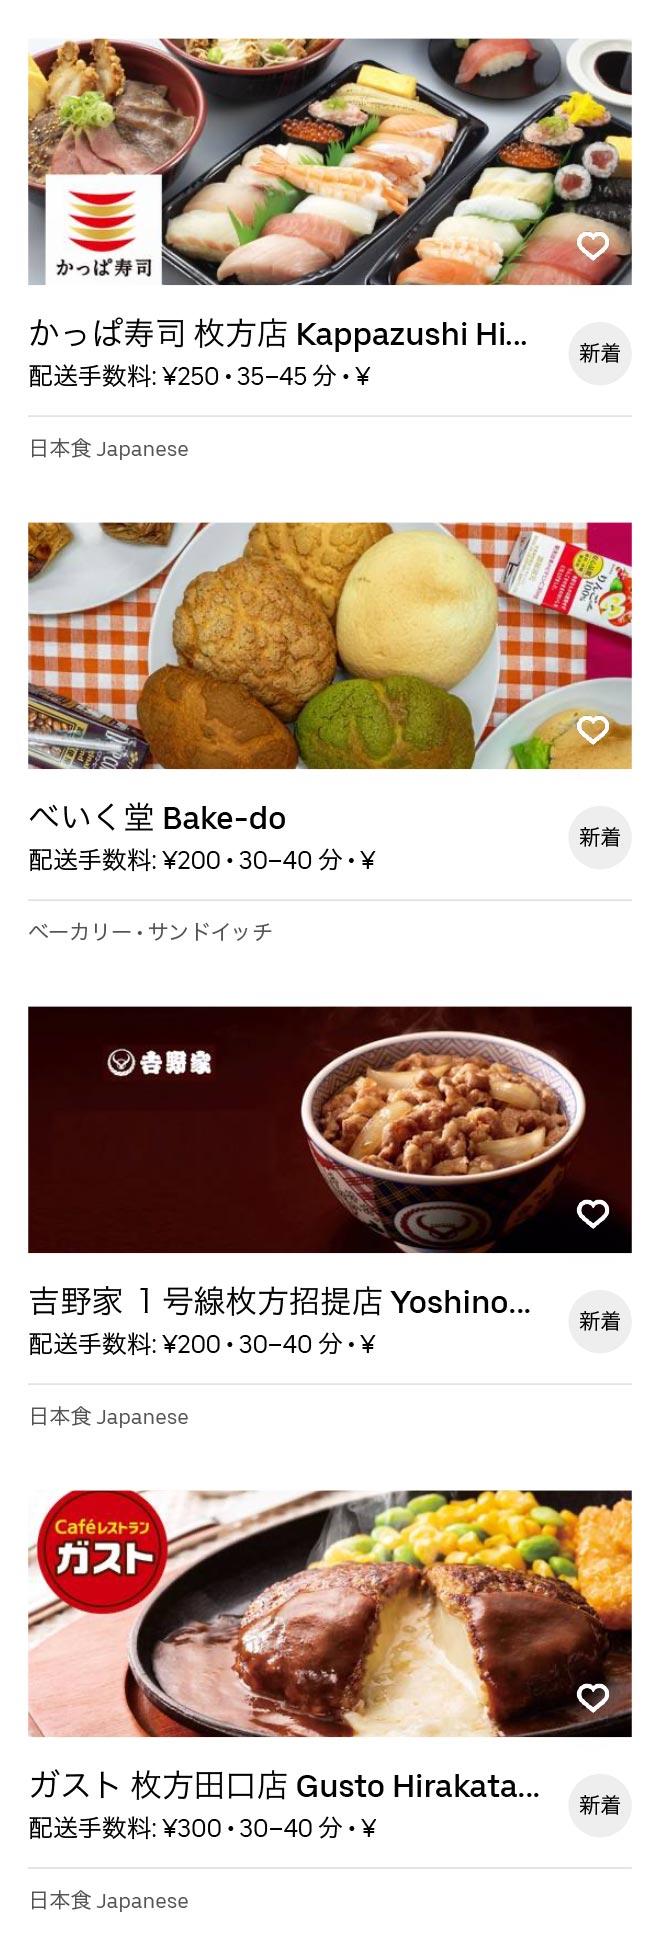 Hirakata nagao menu 2005 03